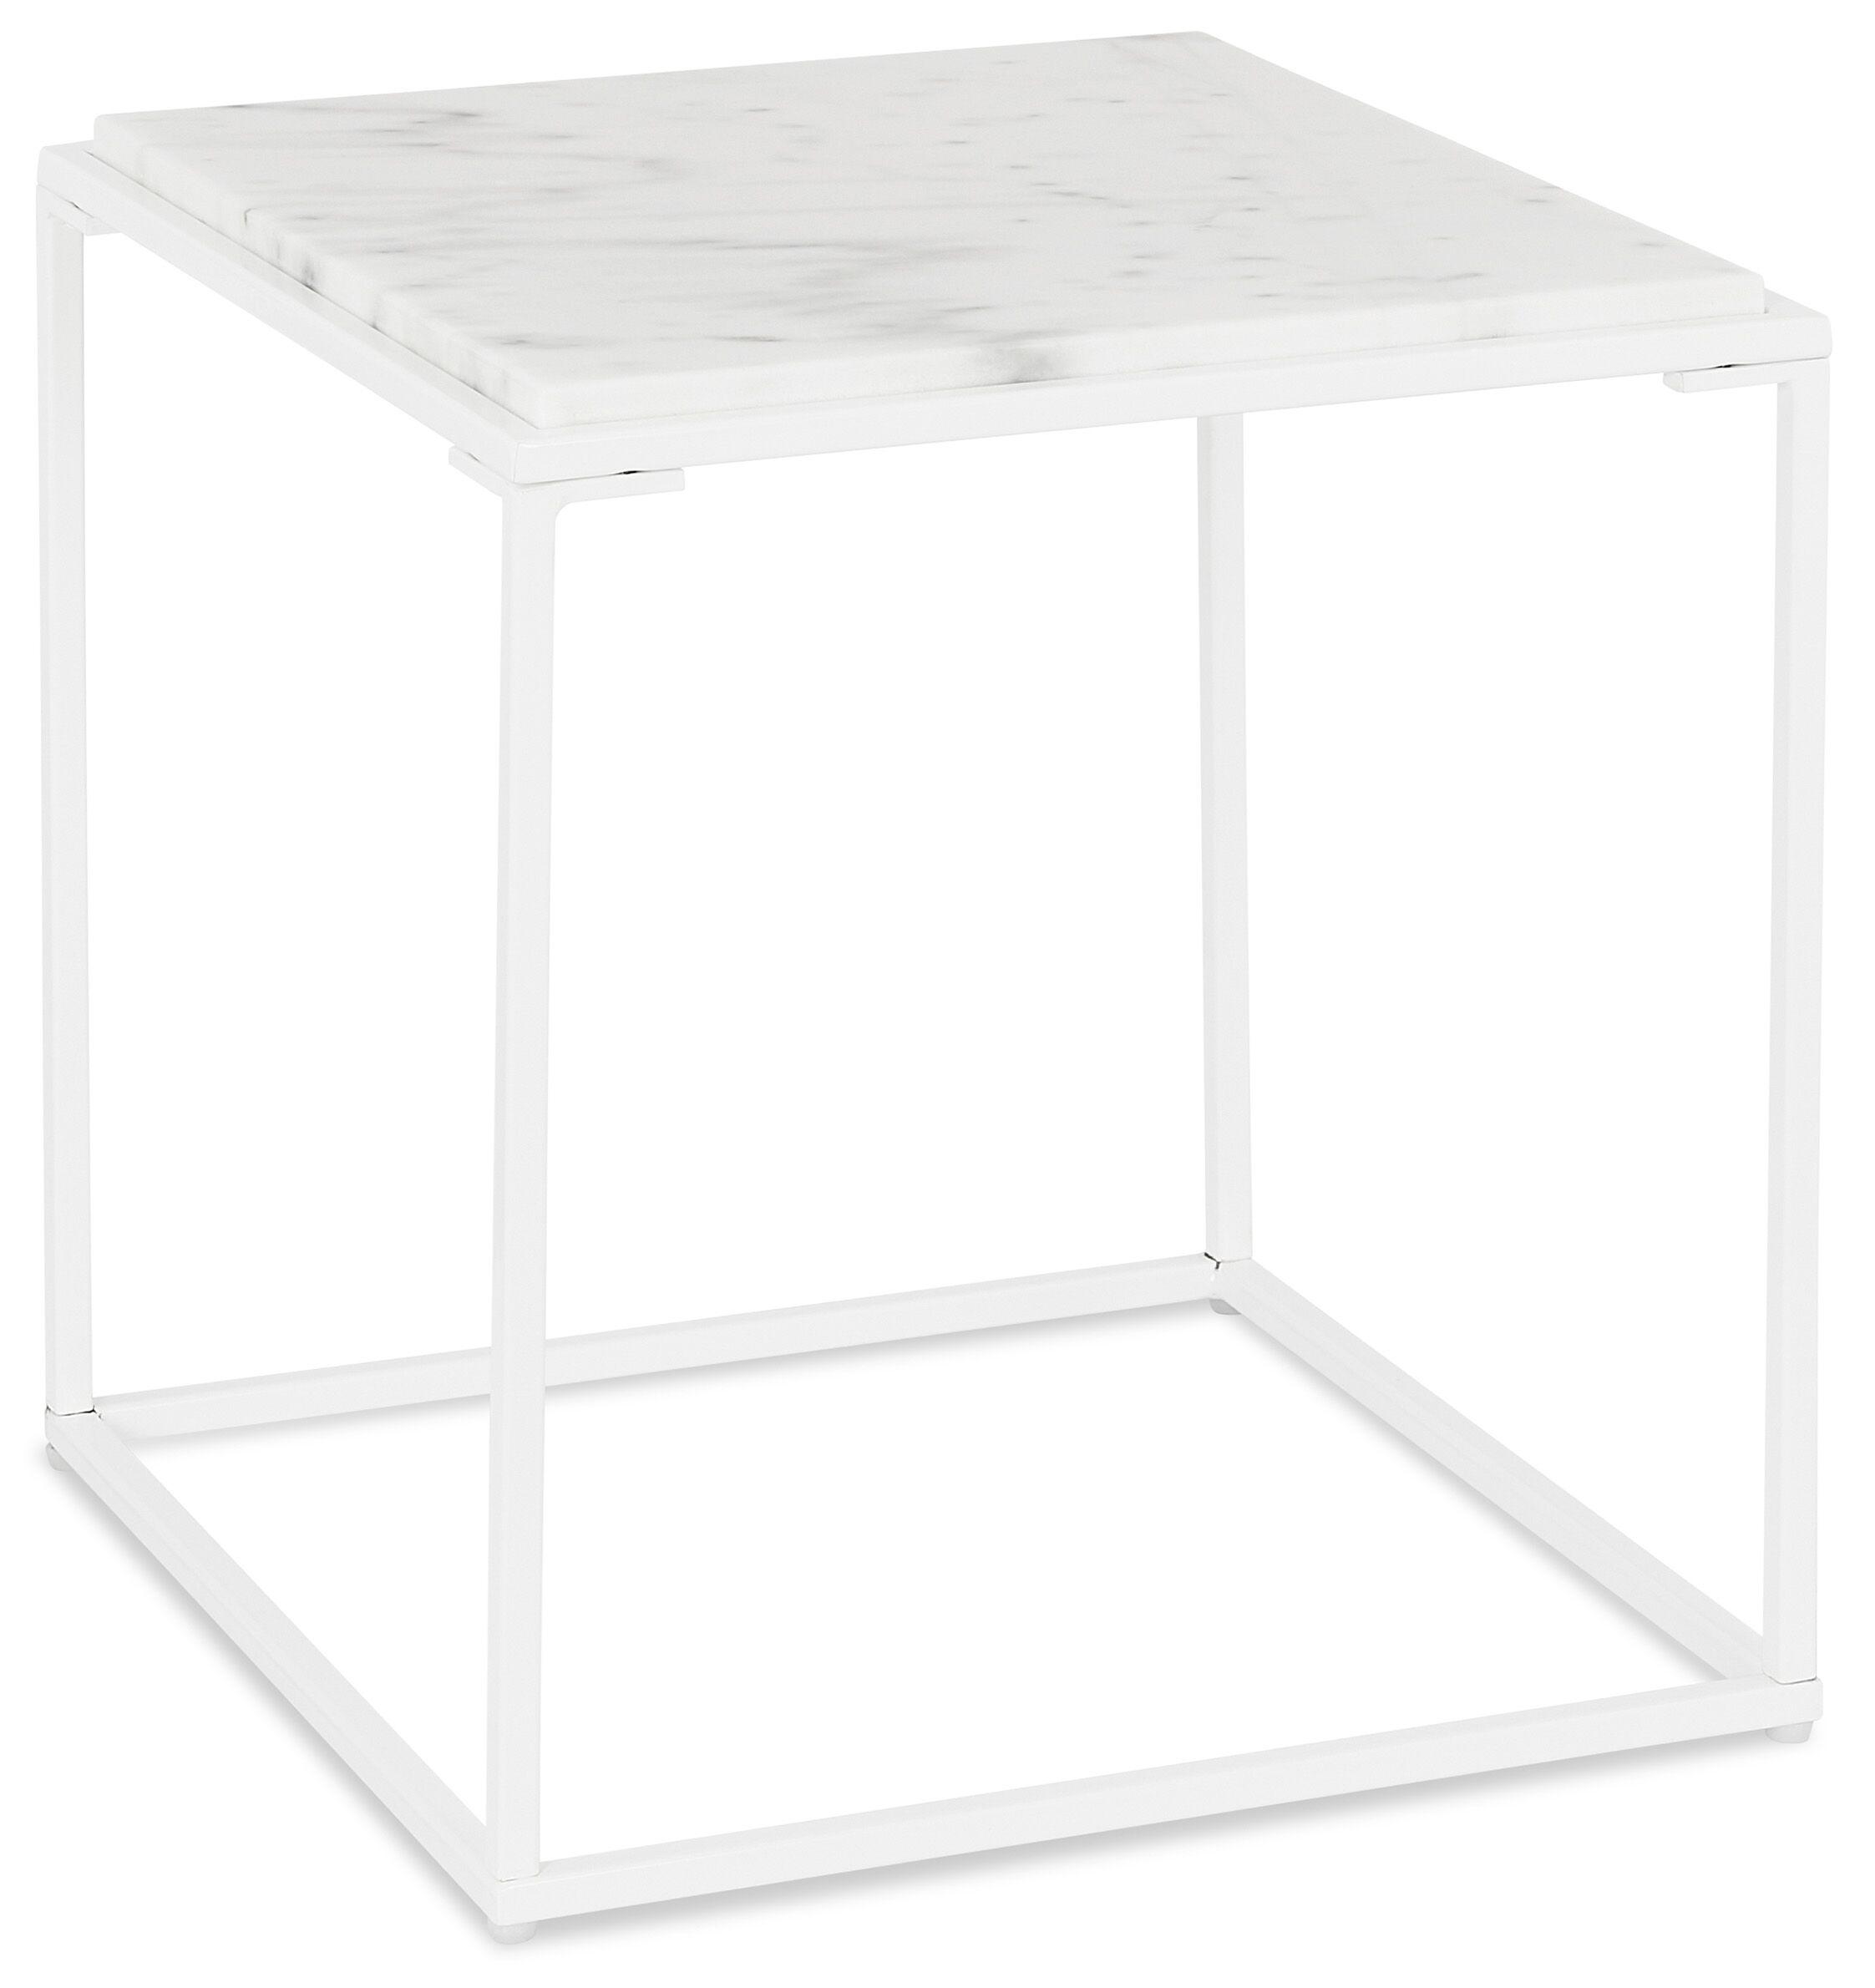 Alterego Table basse d'appoint 'SPIN MINI' blanche en pierre marbrée